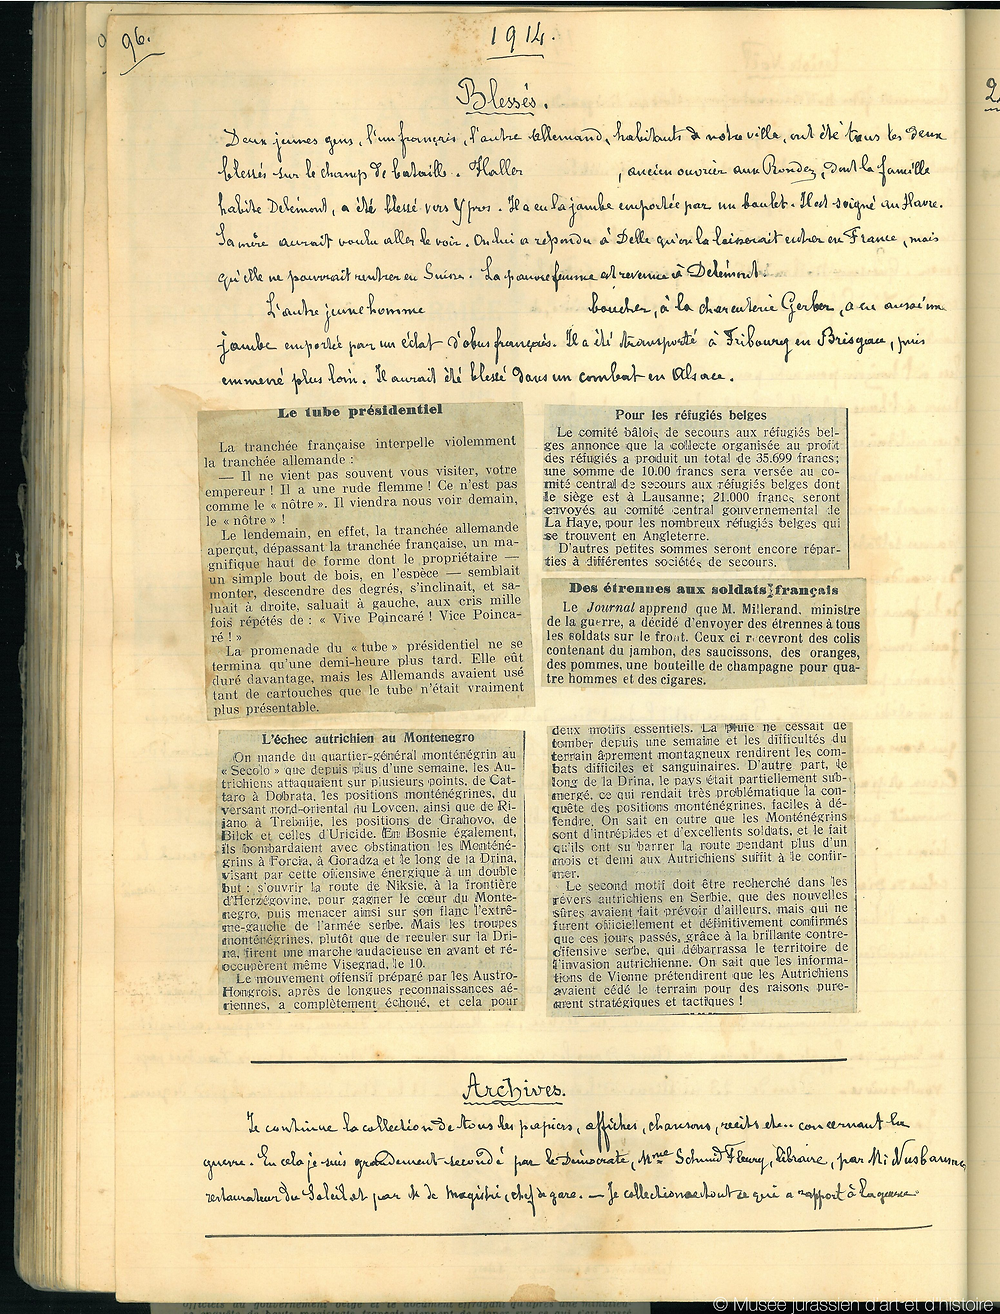 1914_decembre23_96_Copyright.png